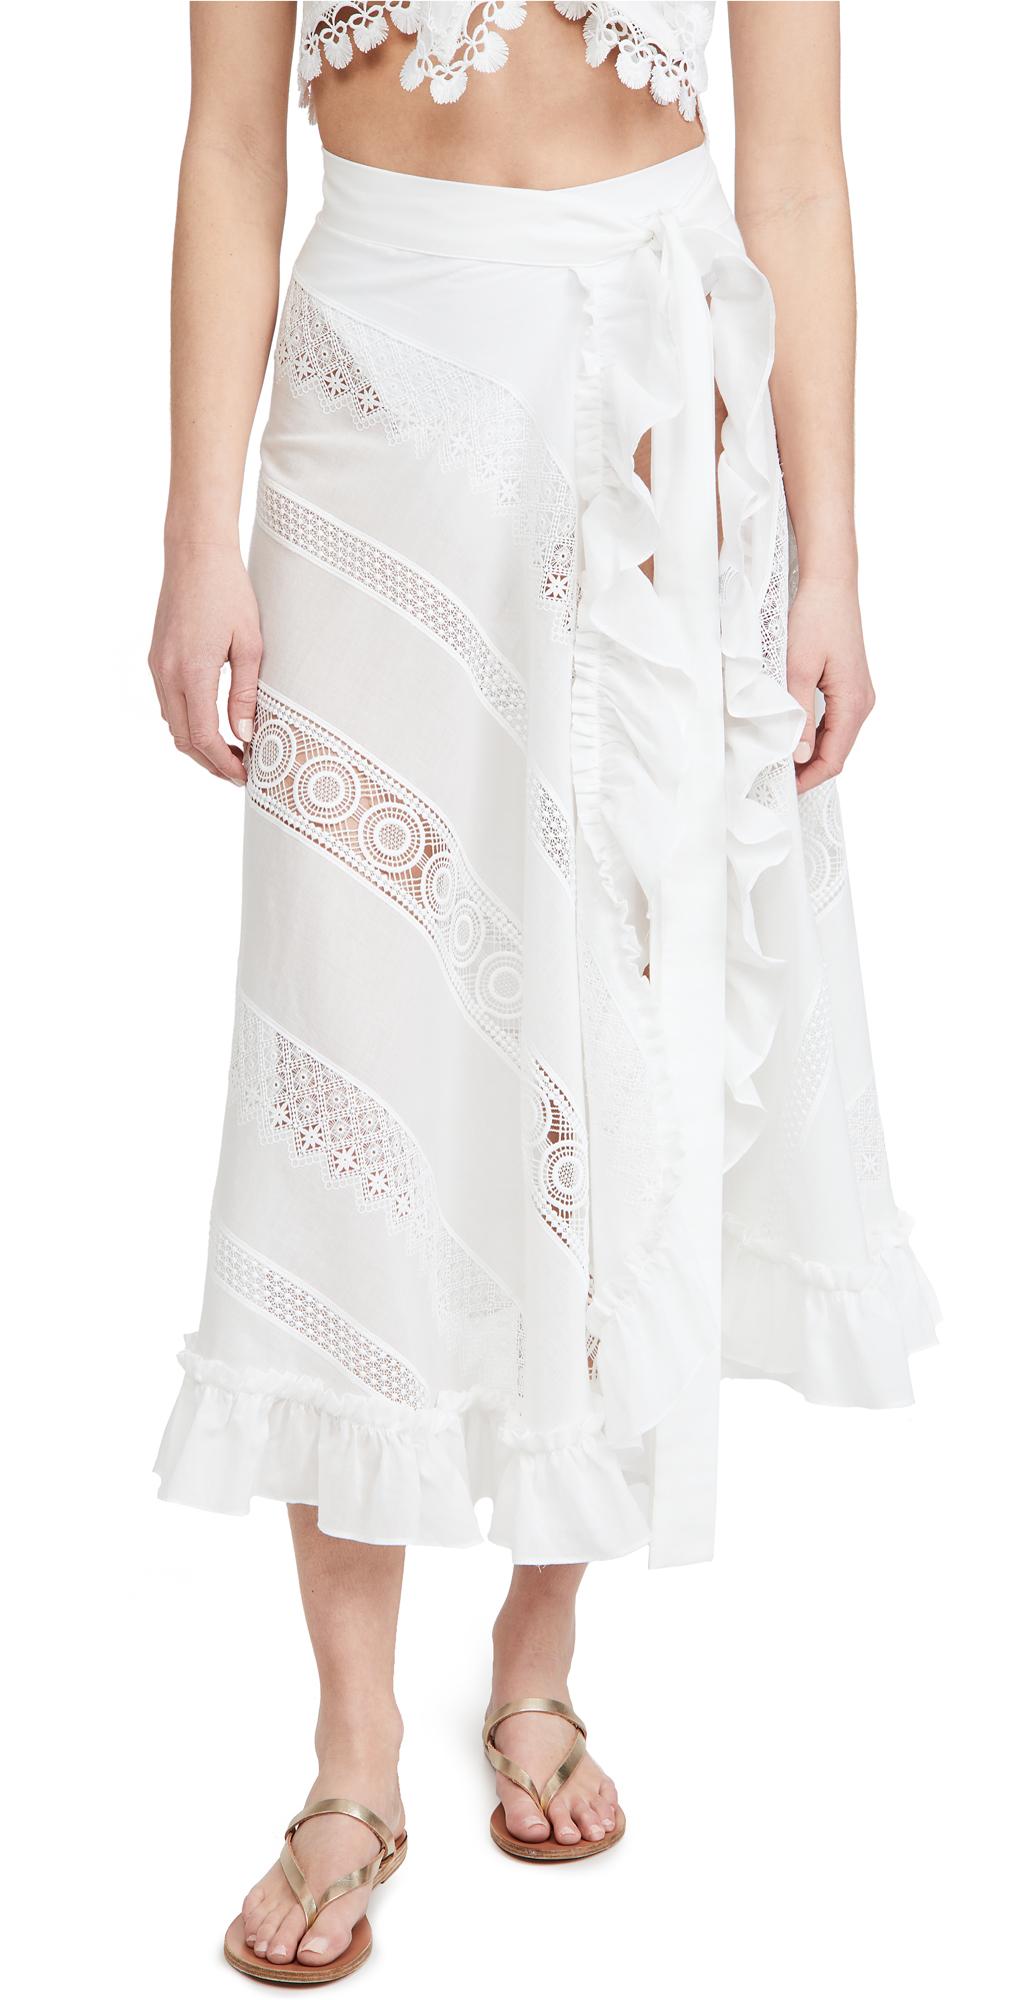 Waimari Sevillana Wrap Skirt